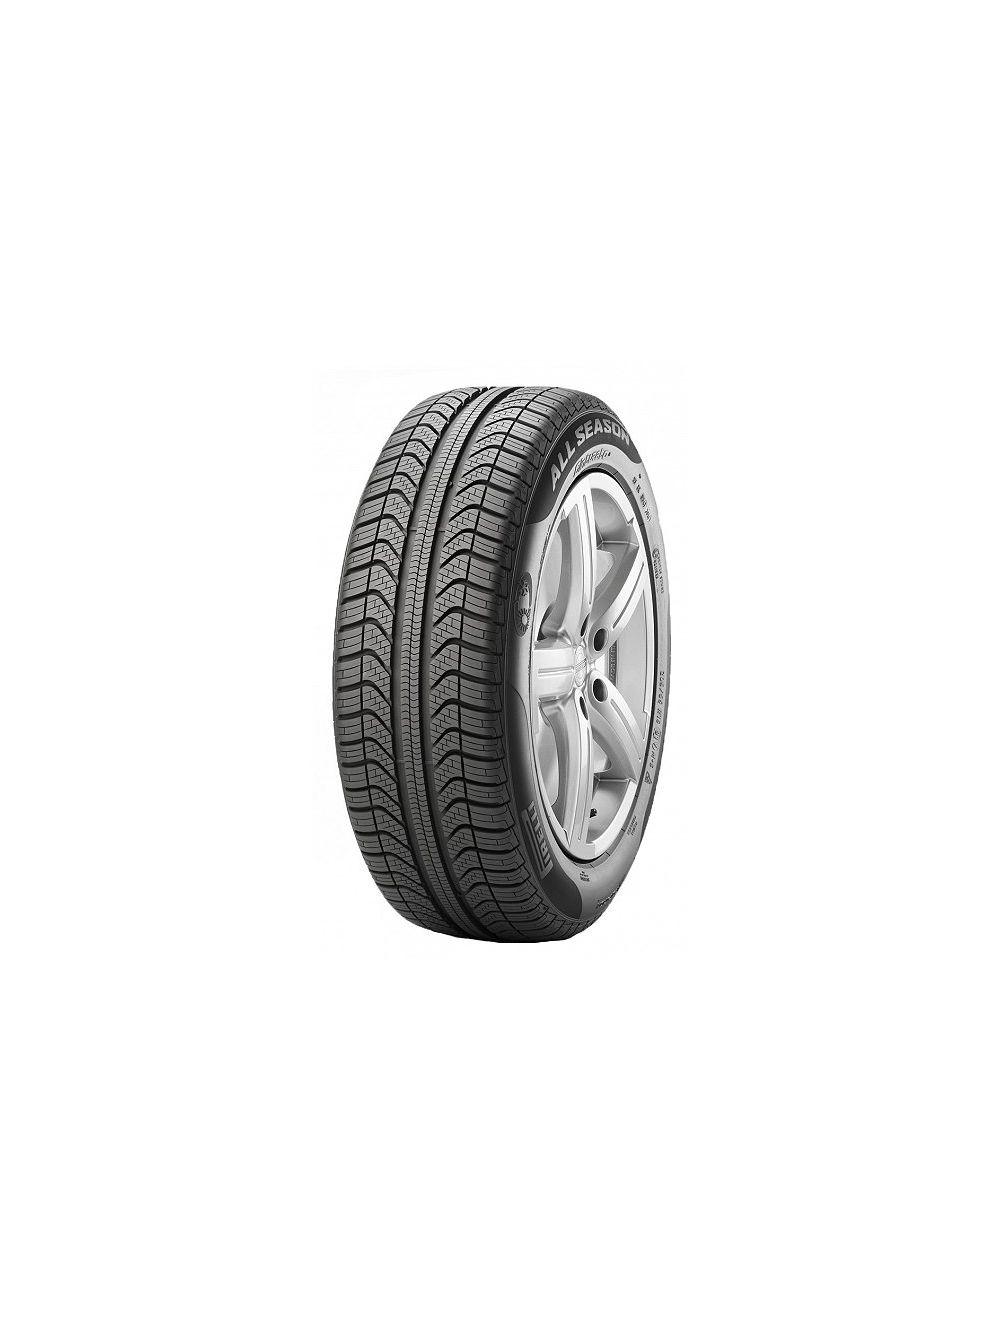 Pirelli 155/70R19 T Cinturato All Season MS Négyévszakos gumi